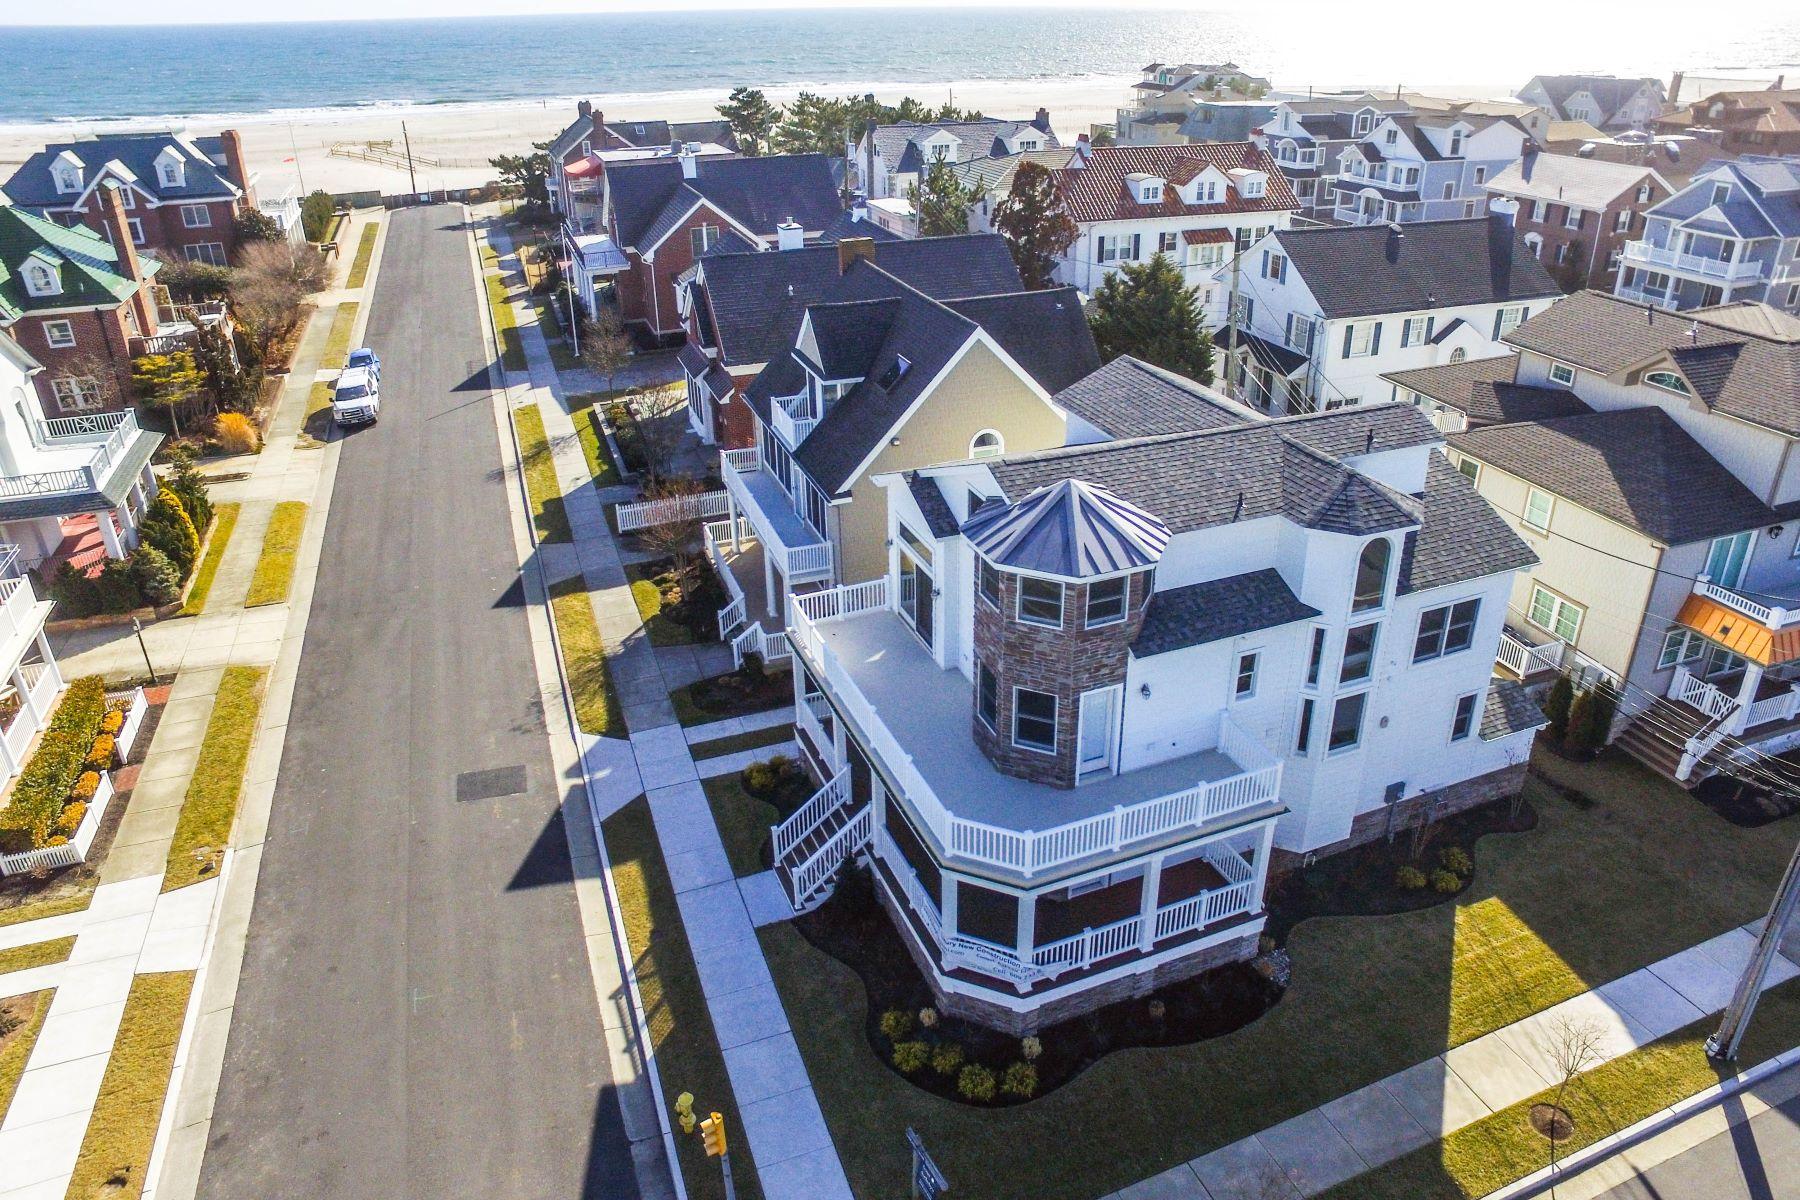 Additional photo for property listing at 100 S Pembroke Ave  Margate, Nueva Jersey 08402 Estados Unidos